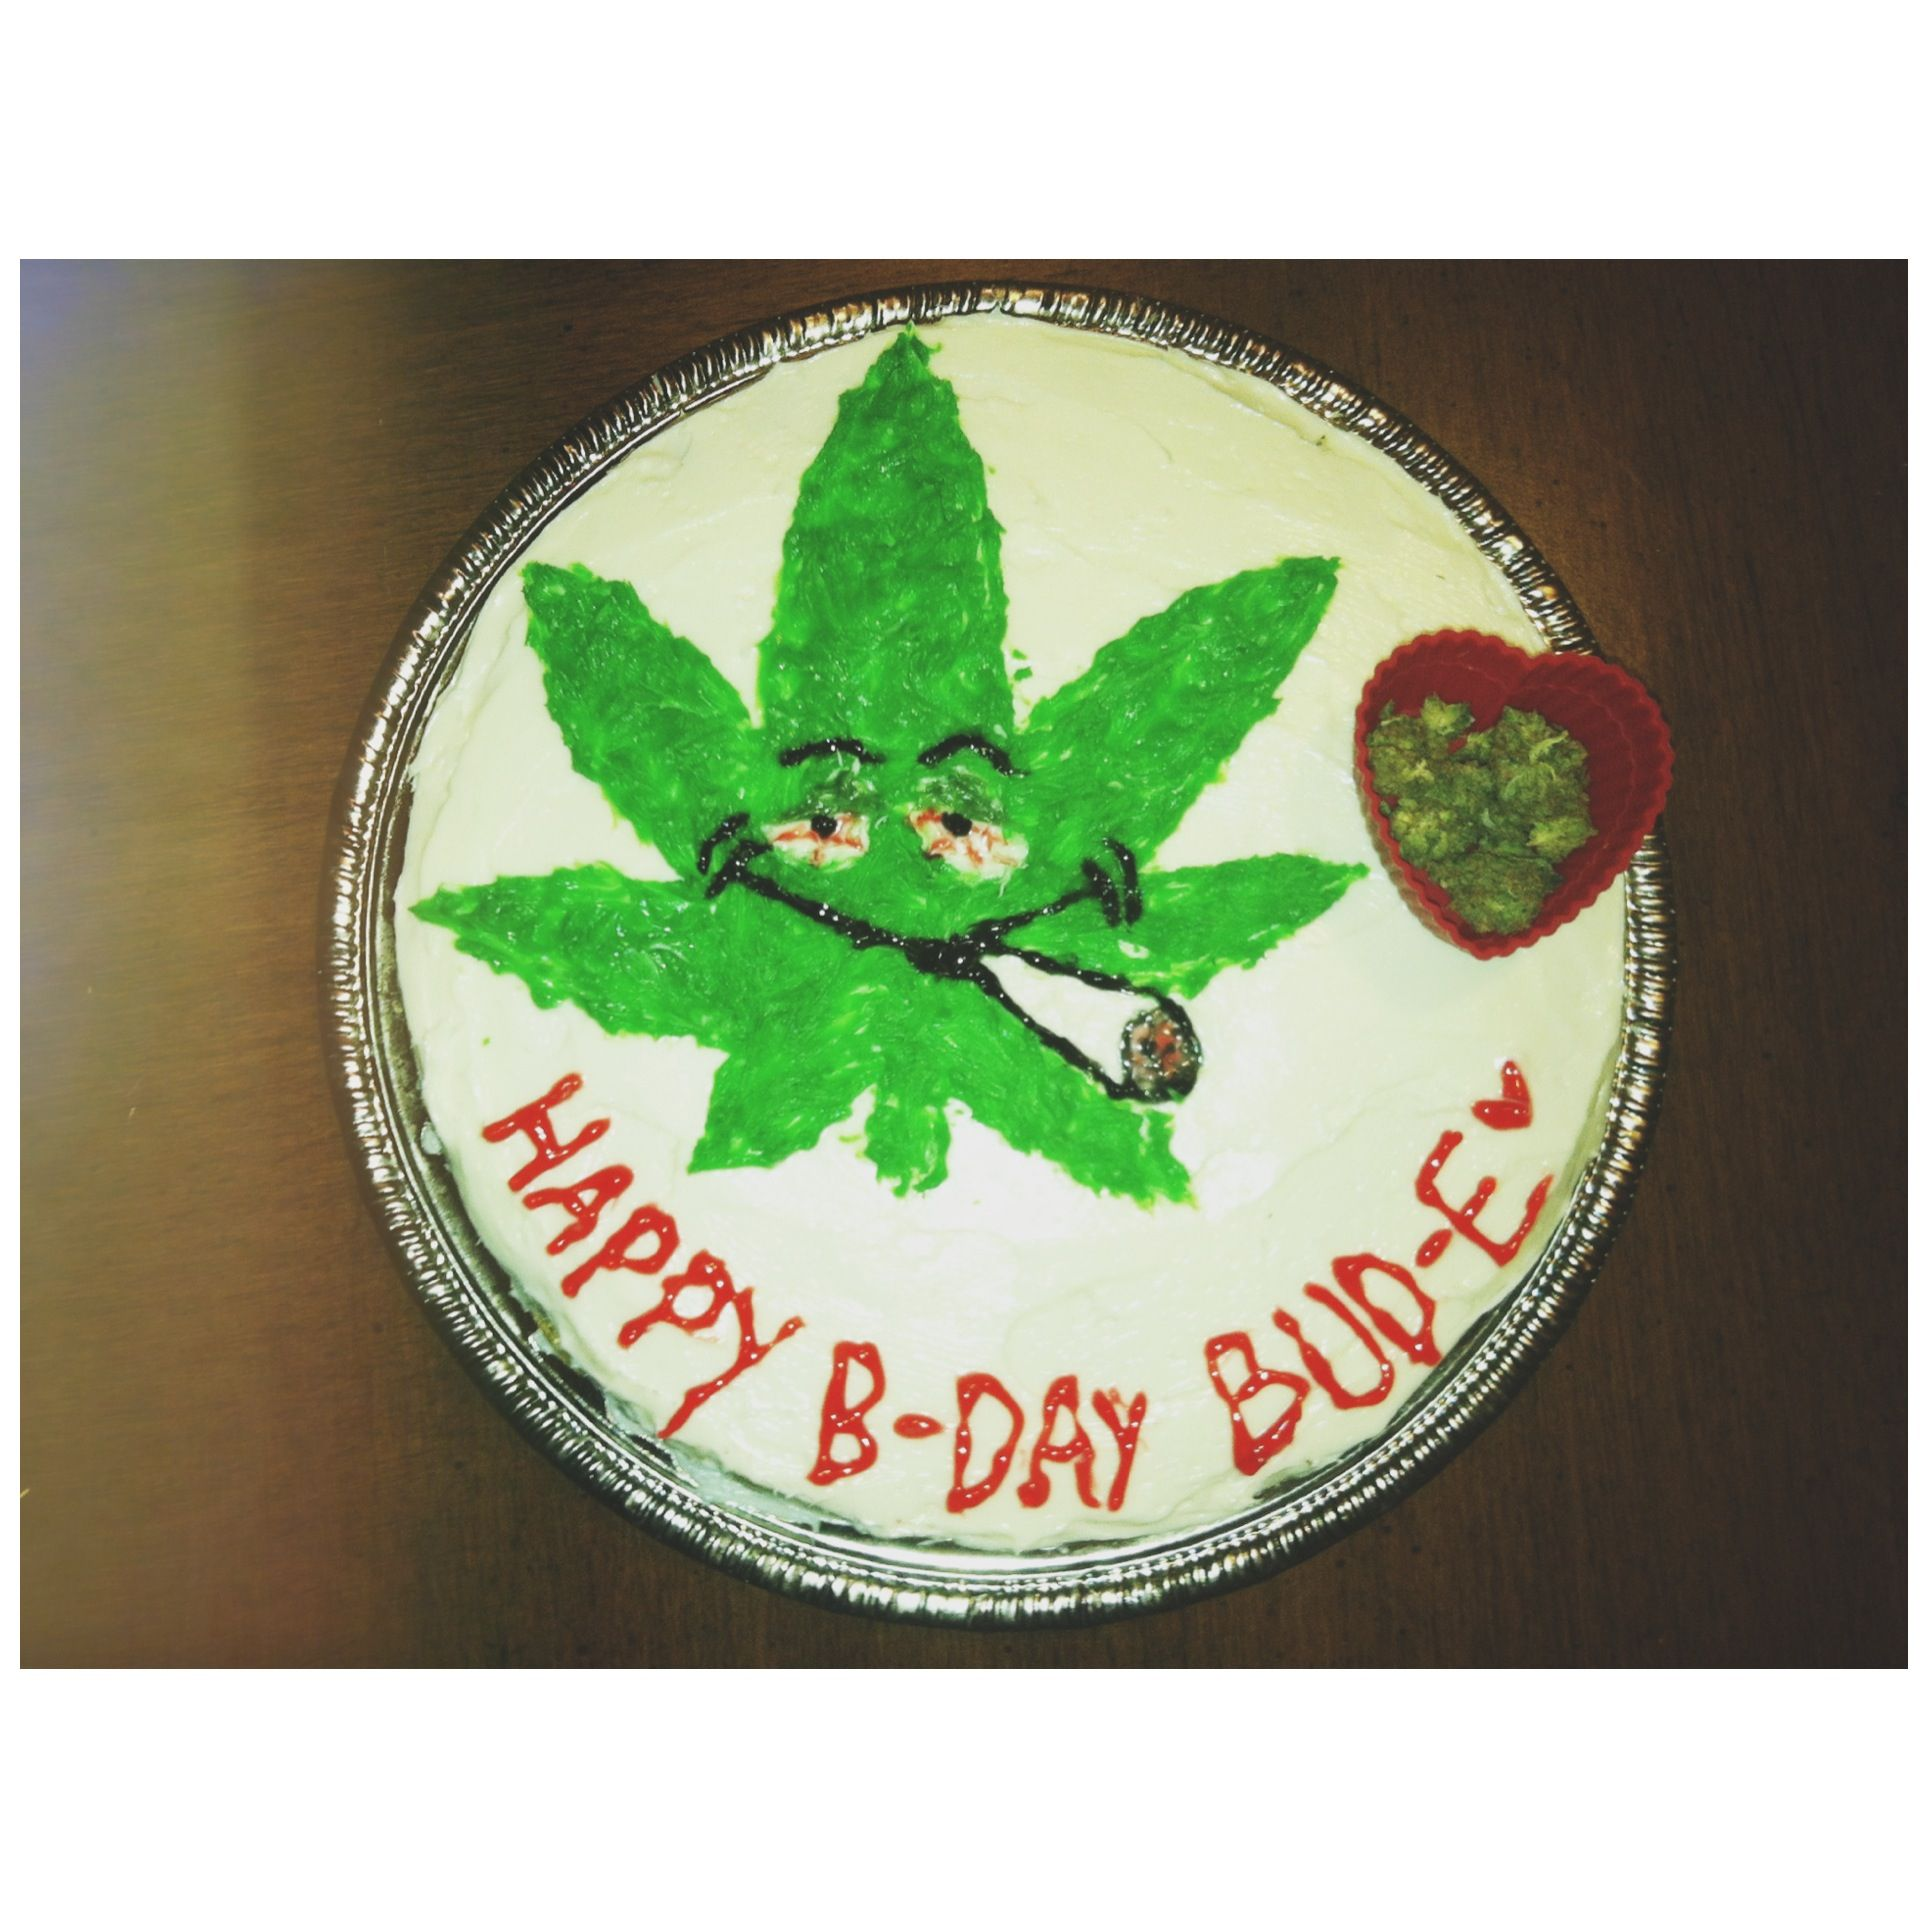 homemade weed birthday cake i made. | cakes | pinterest | birthday